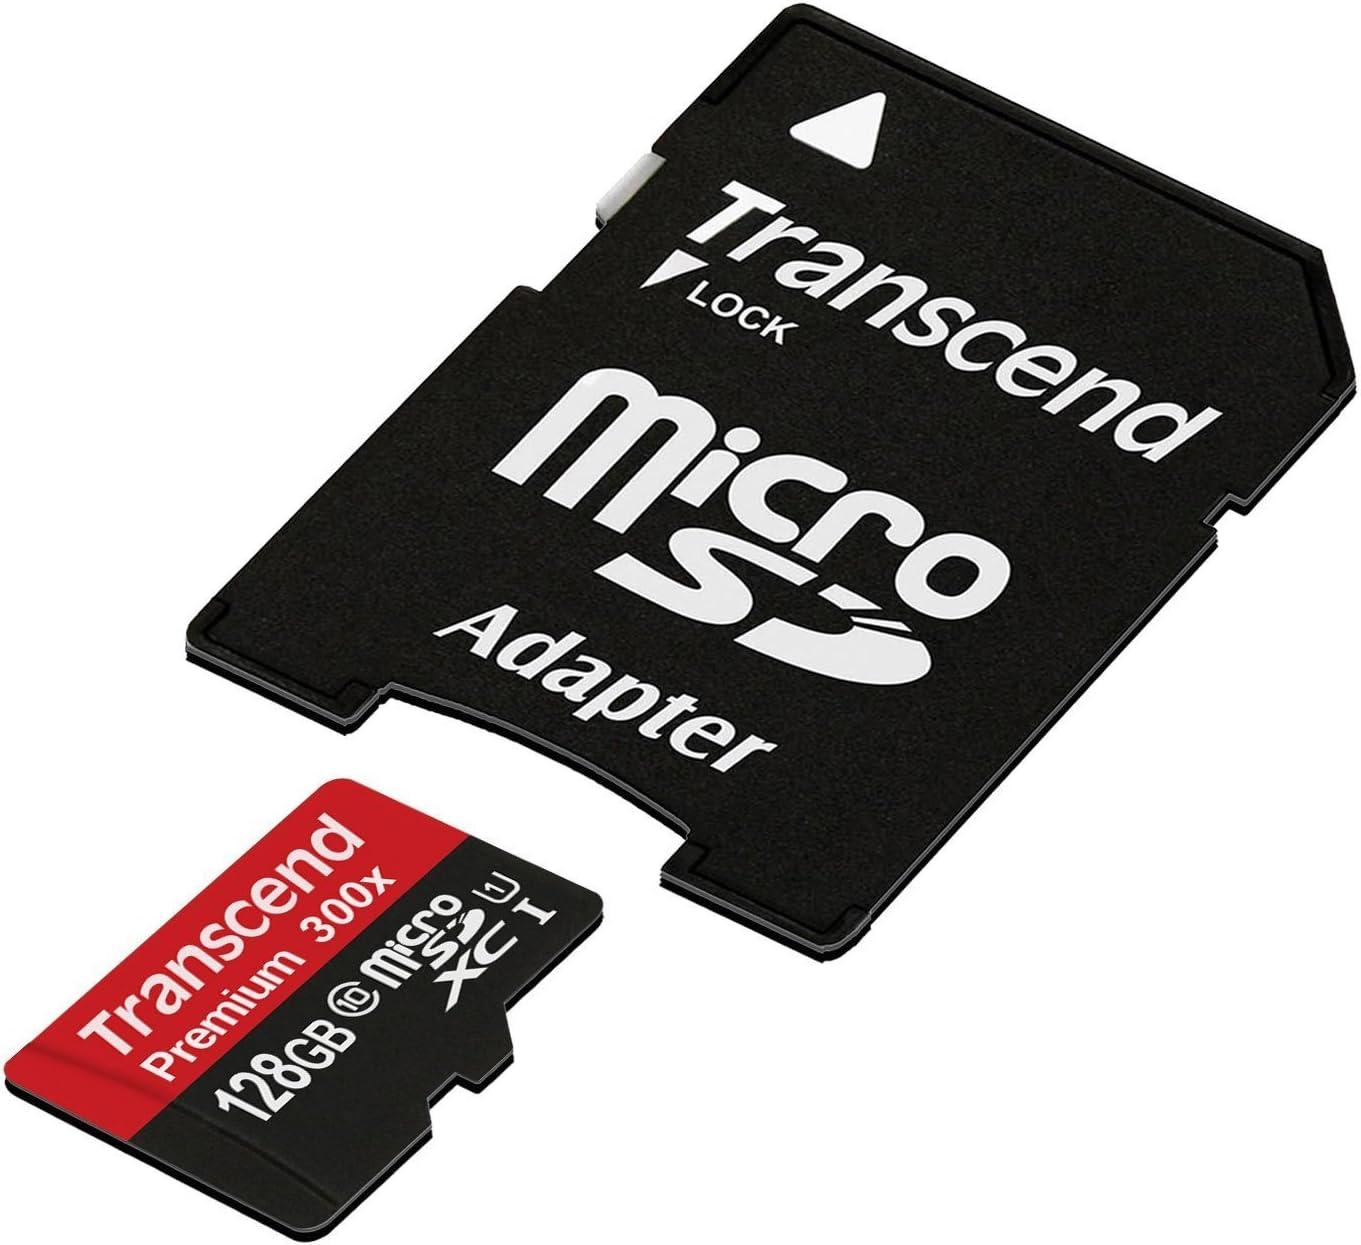 Samsung Galaxy Tab E 9.6 Tablet Memory Card 128GB microSDHC Memory Card with SD Adapter